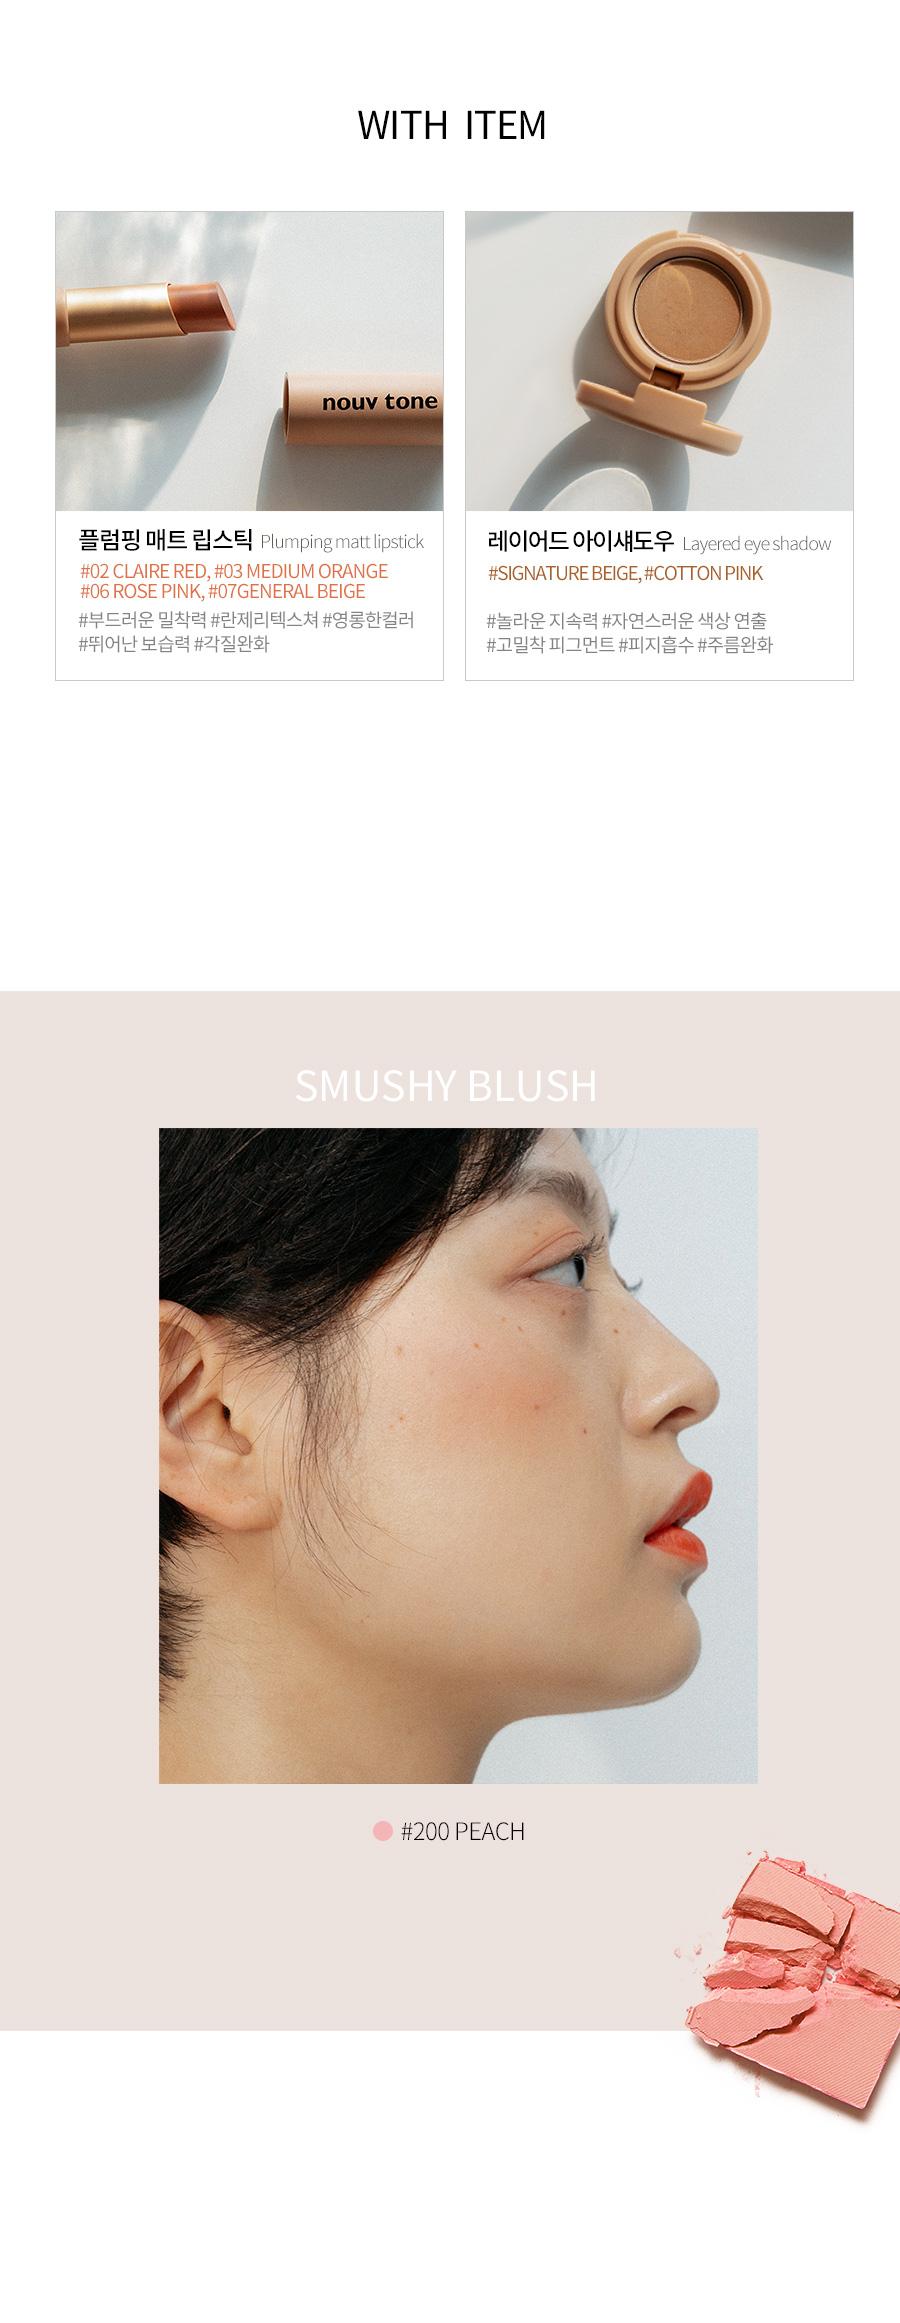 Smooth Blush _ # 200 Pitch